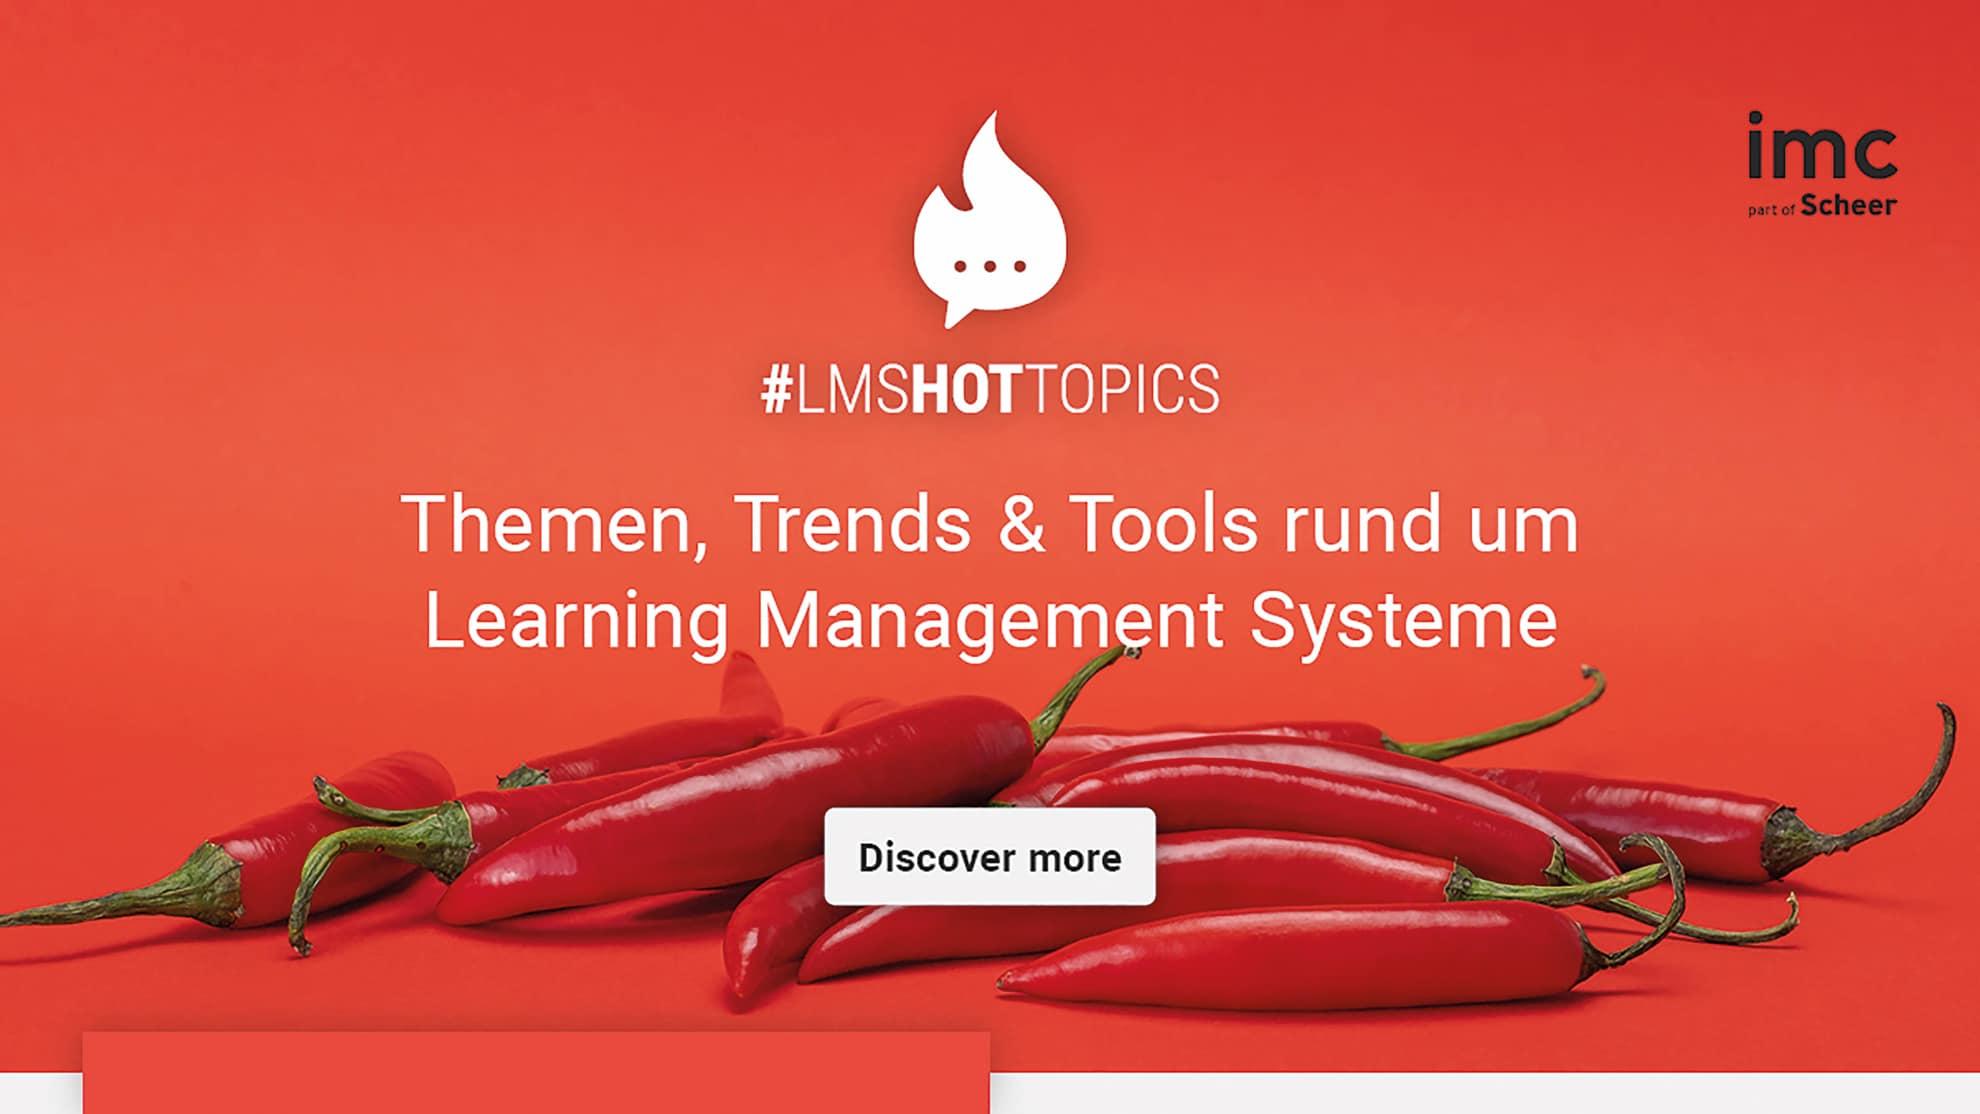 imc Trends und Themen um e-Learning